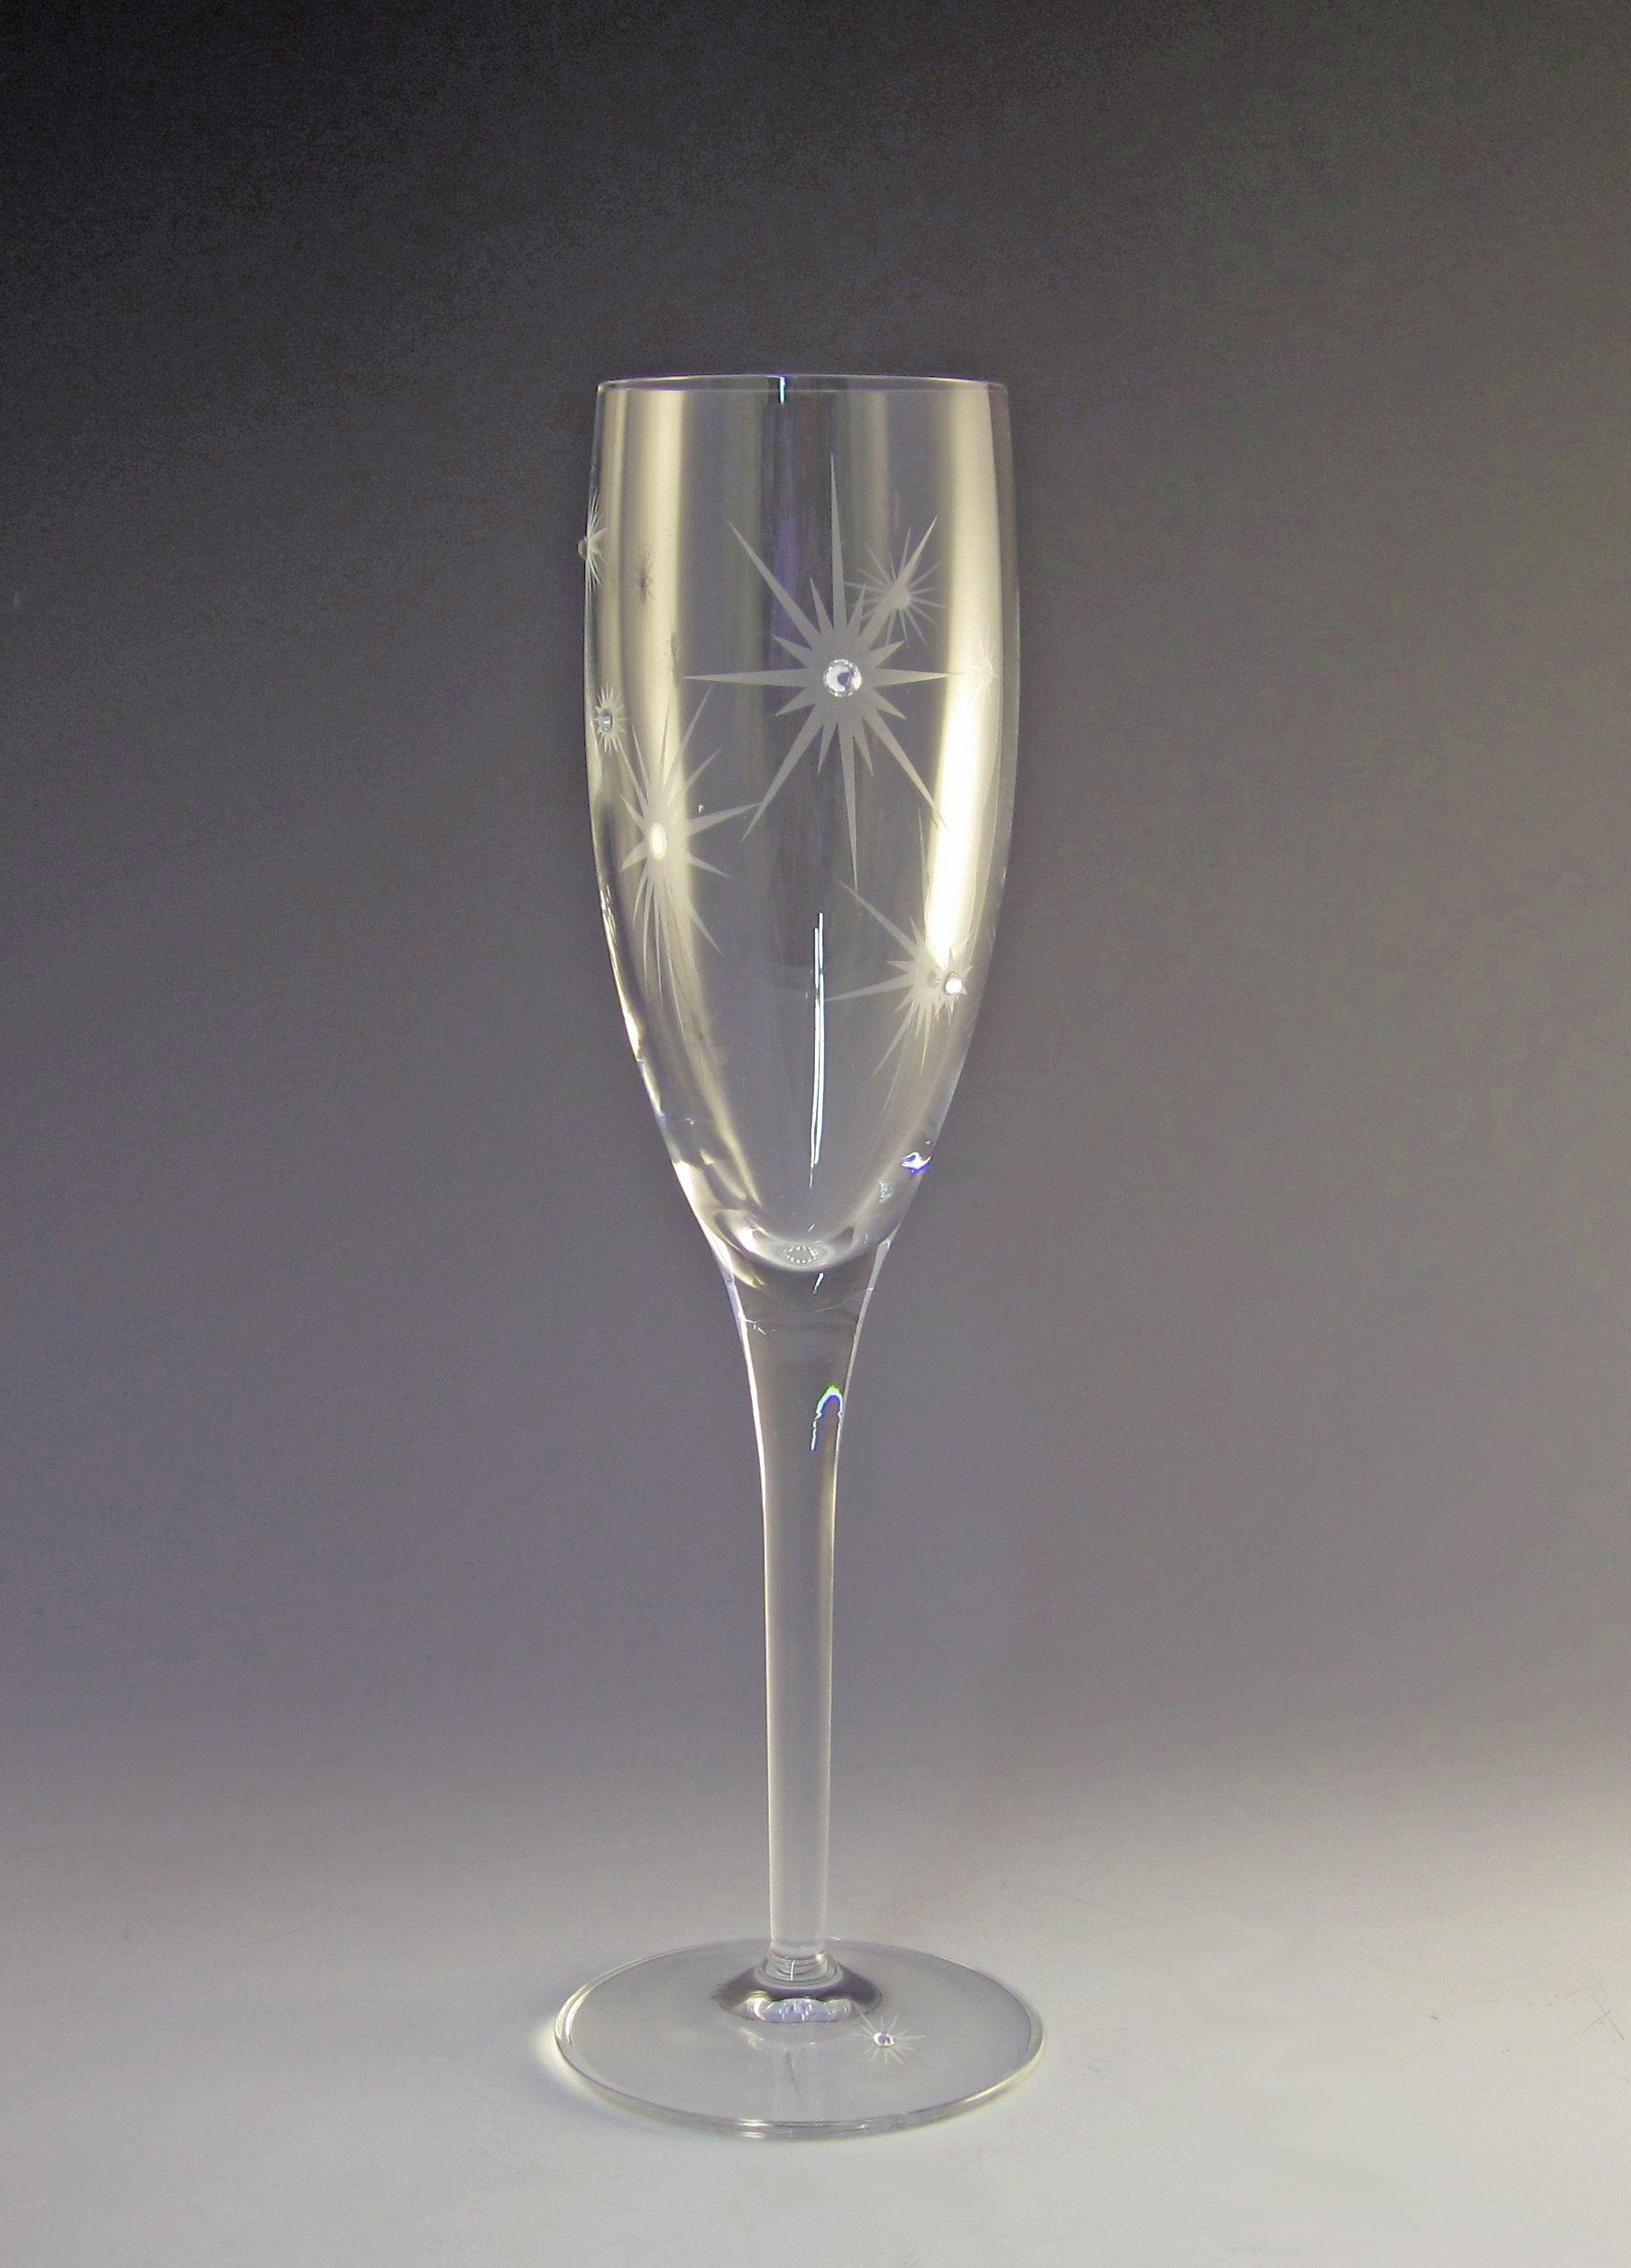 685ae9bf156b Star Twinkle 7oz Champagne Flute (Set of 2) $49.99 | AstaGlass on ...